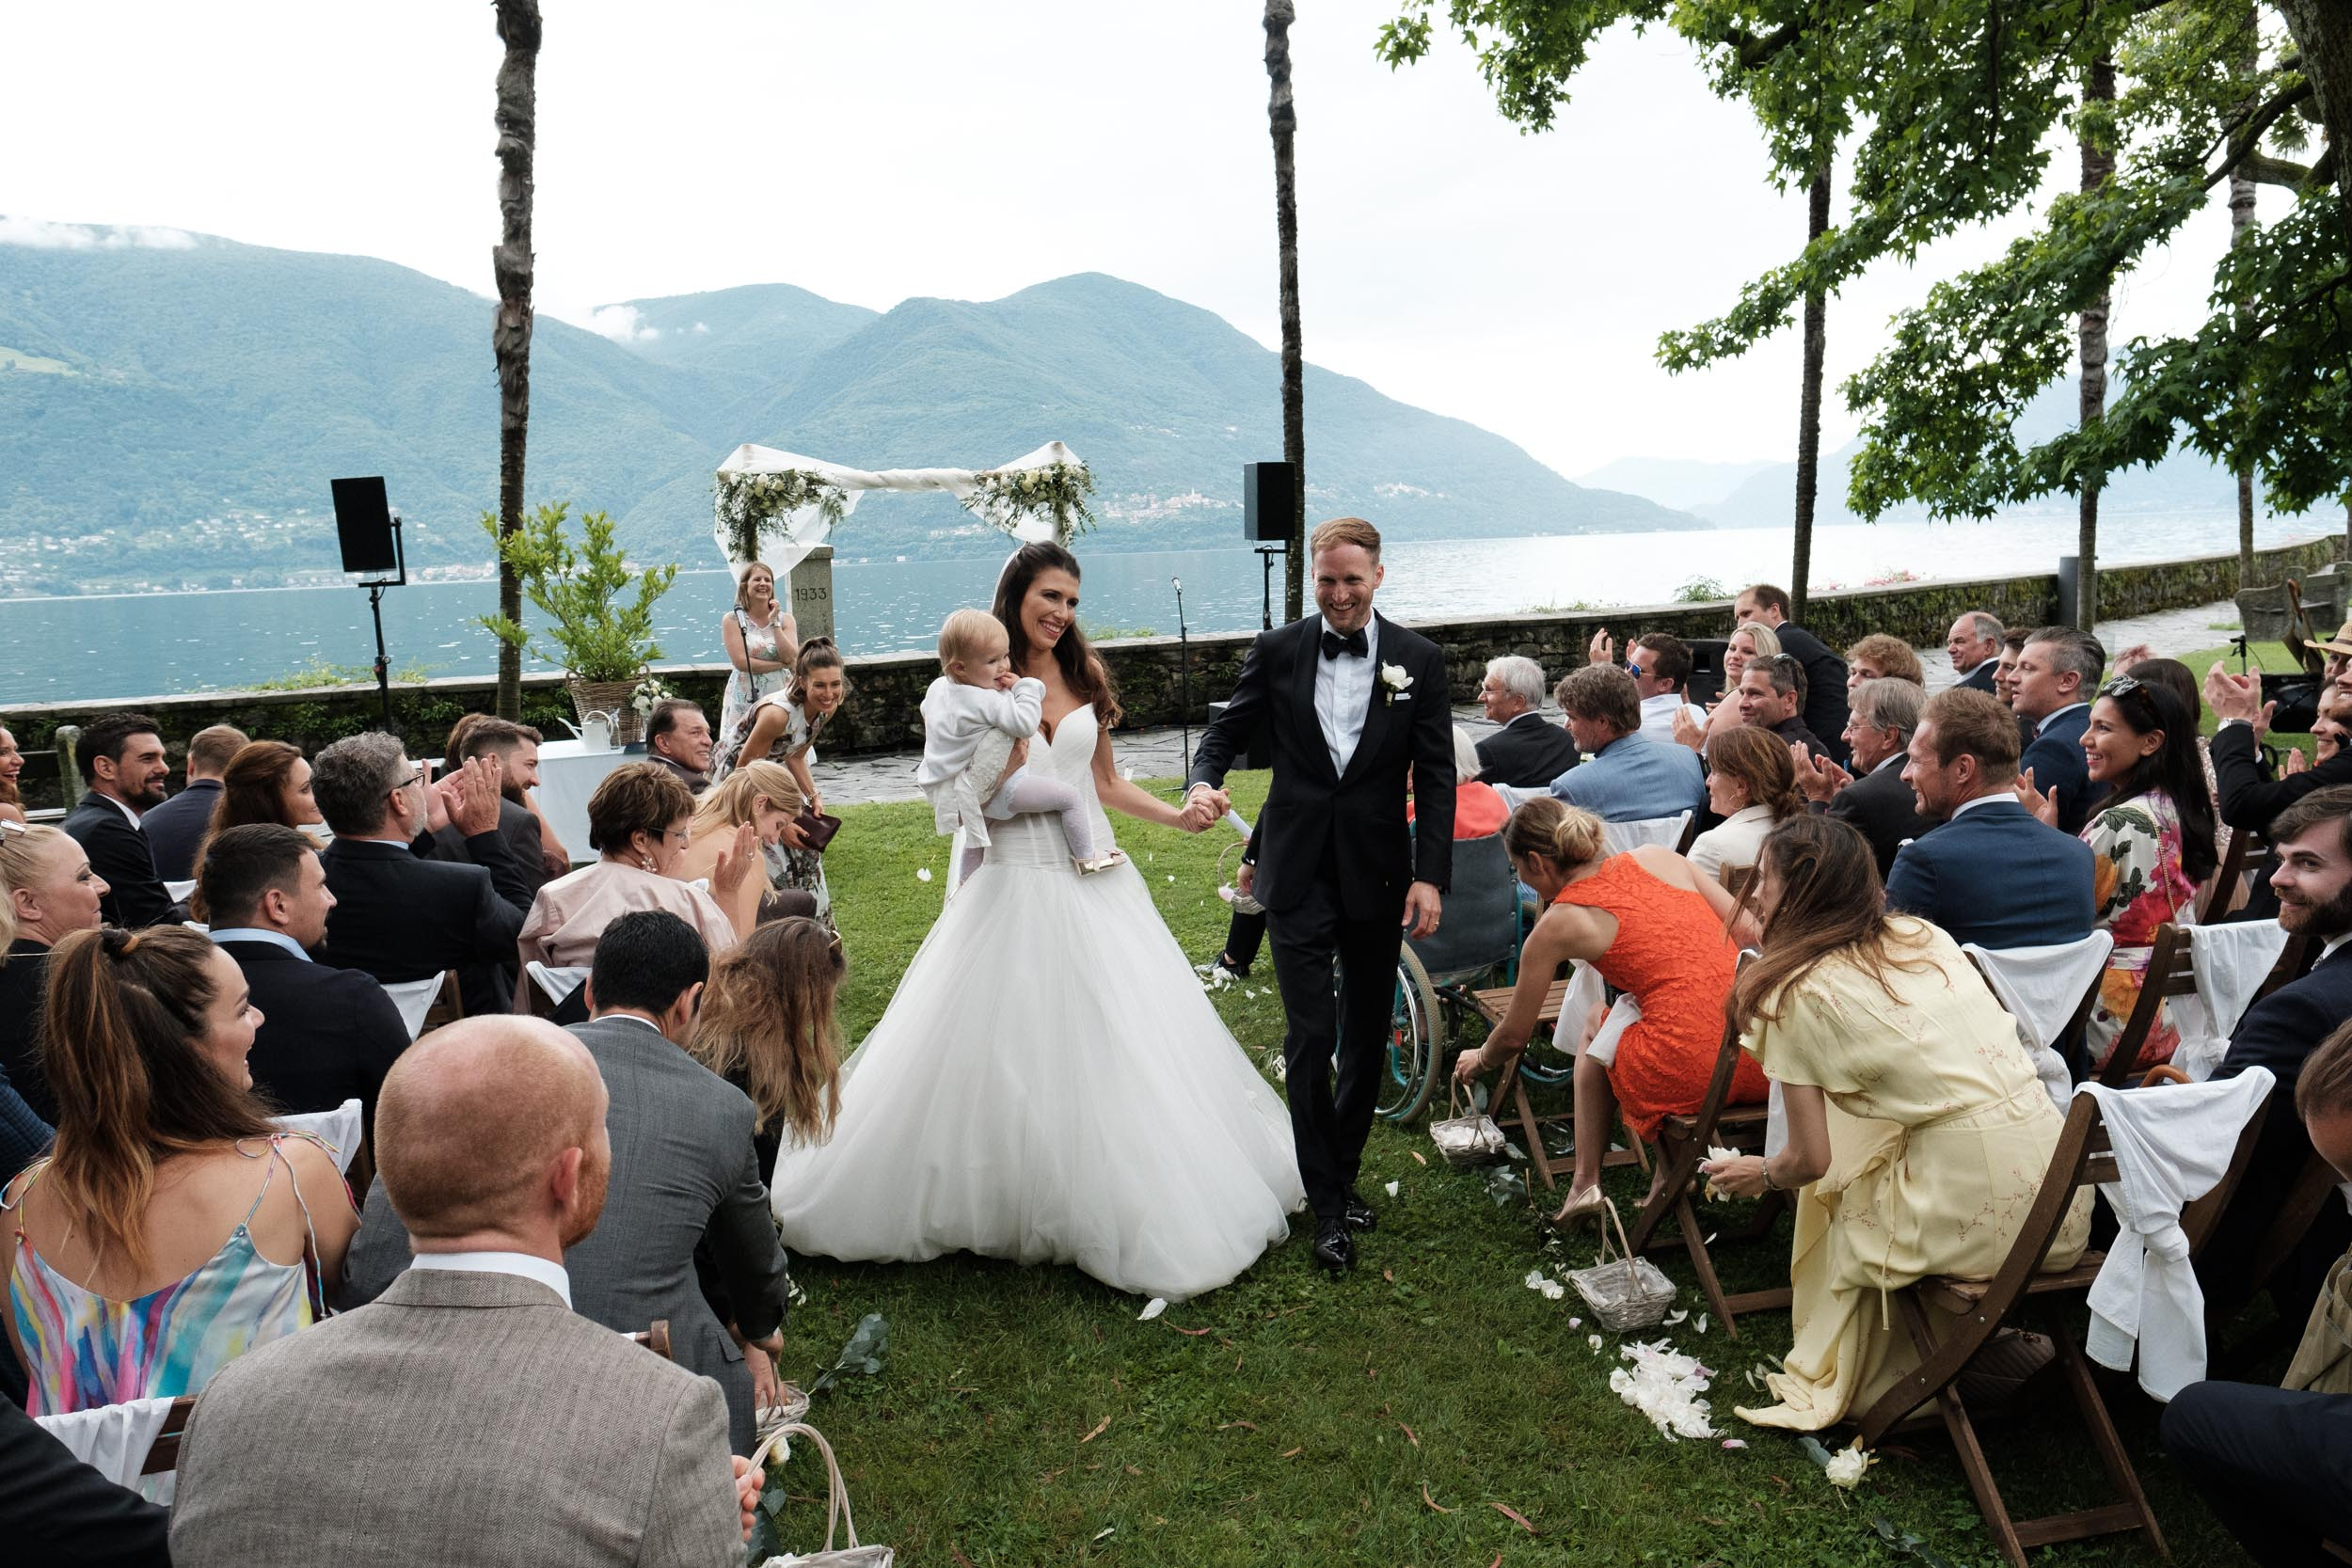 olivia-andreas-wedding-switzerland-323.jpg